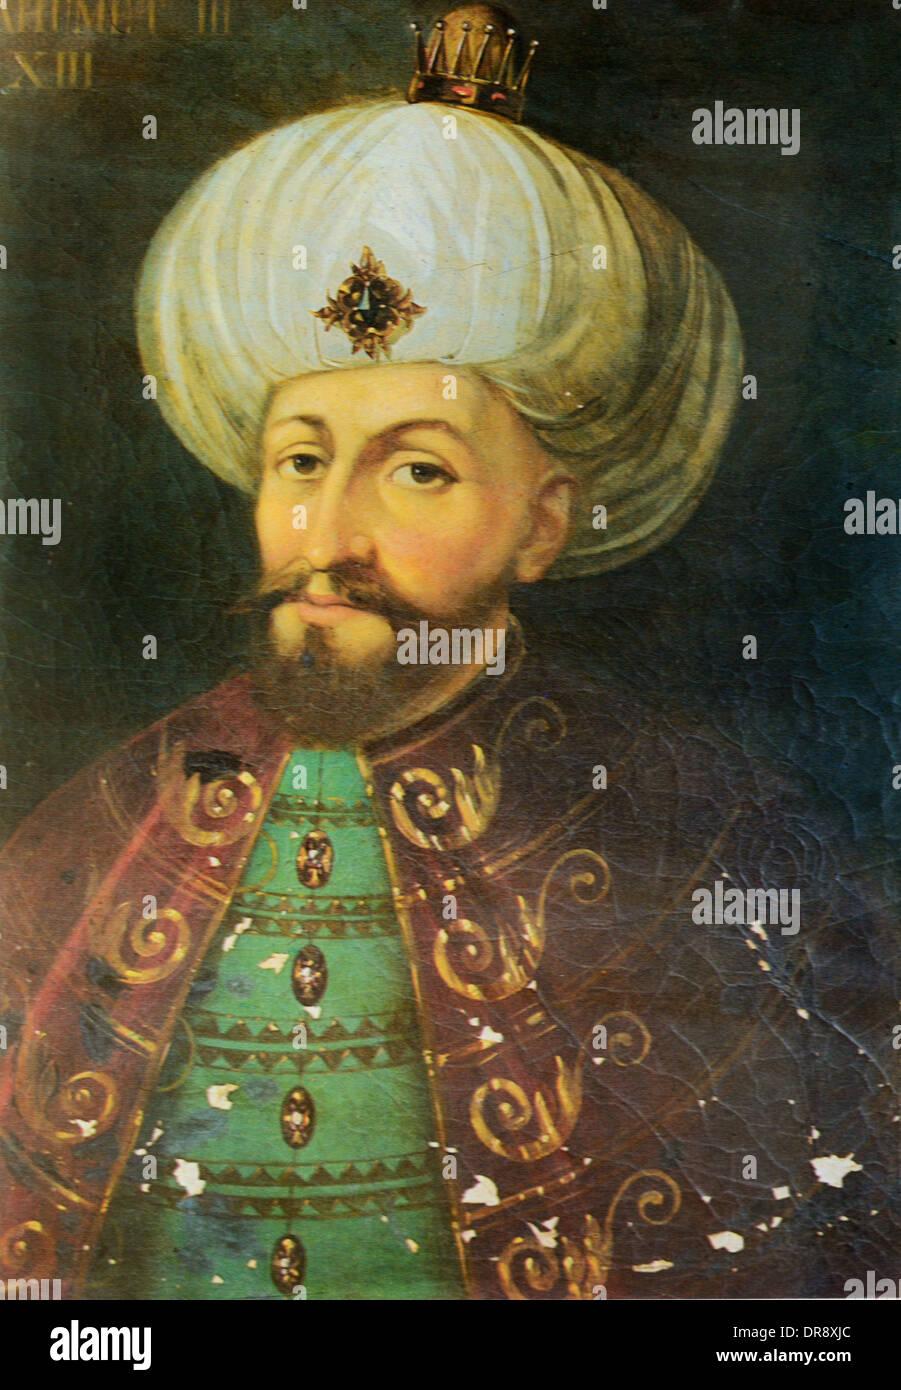 Turkish Ottoman Sultan Mehmed III (1566-1603) Portrait Painting with Turban Stock Photo